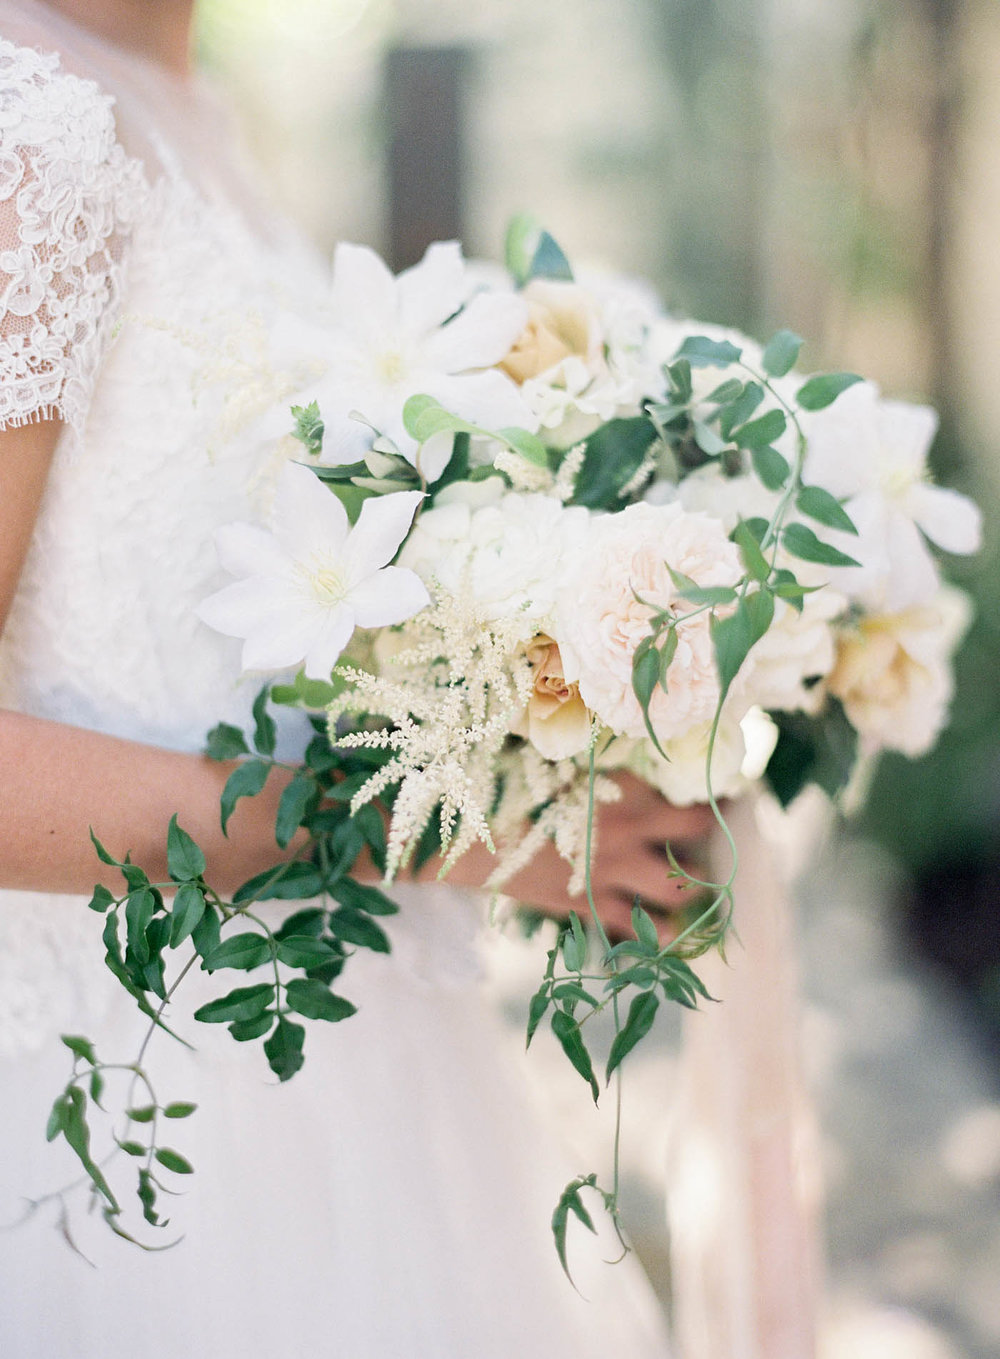 san-juan-capistrano-wedding-jen-huang-8.jpg